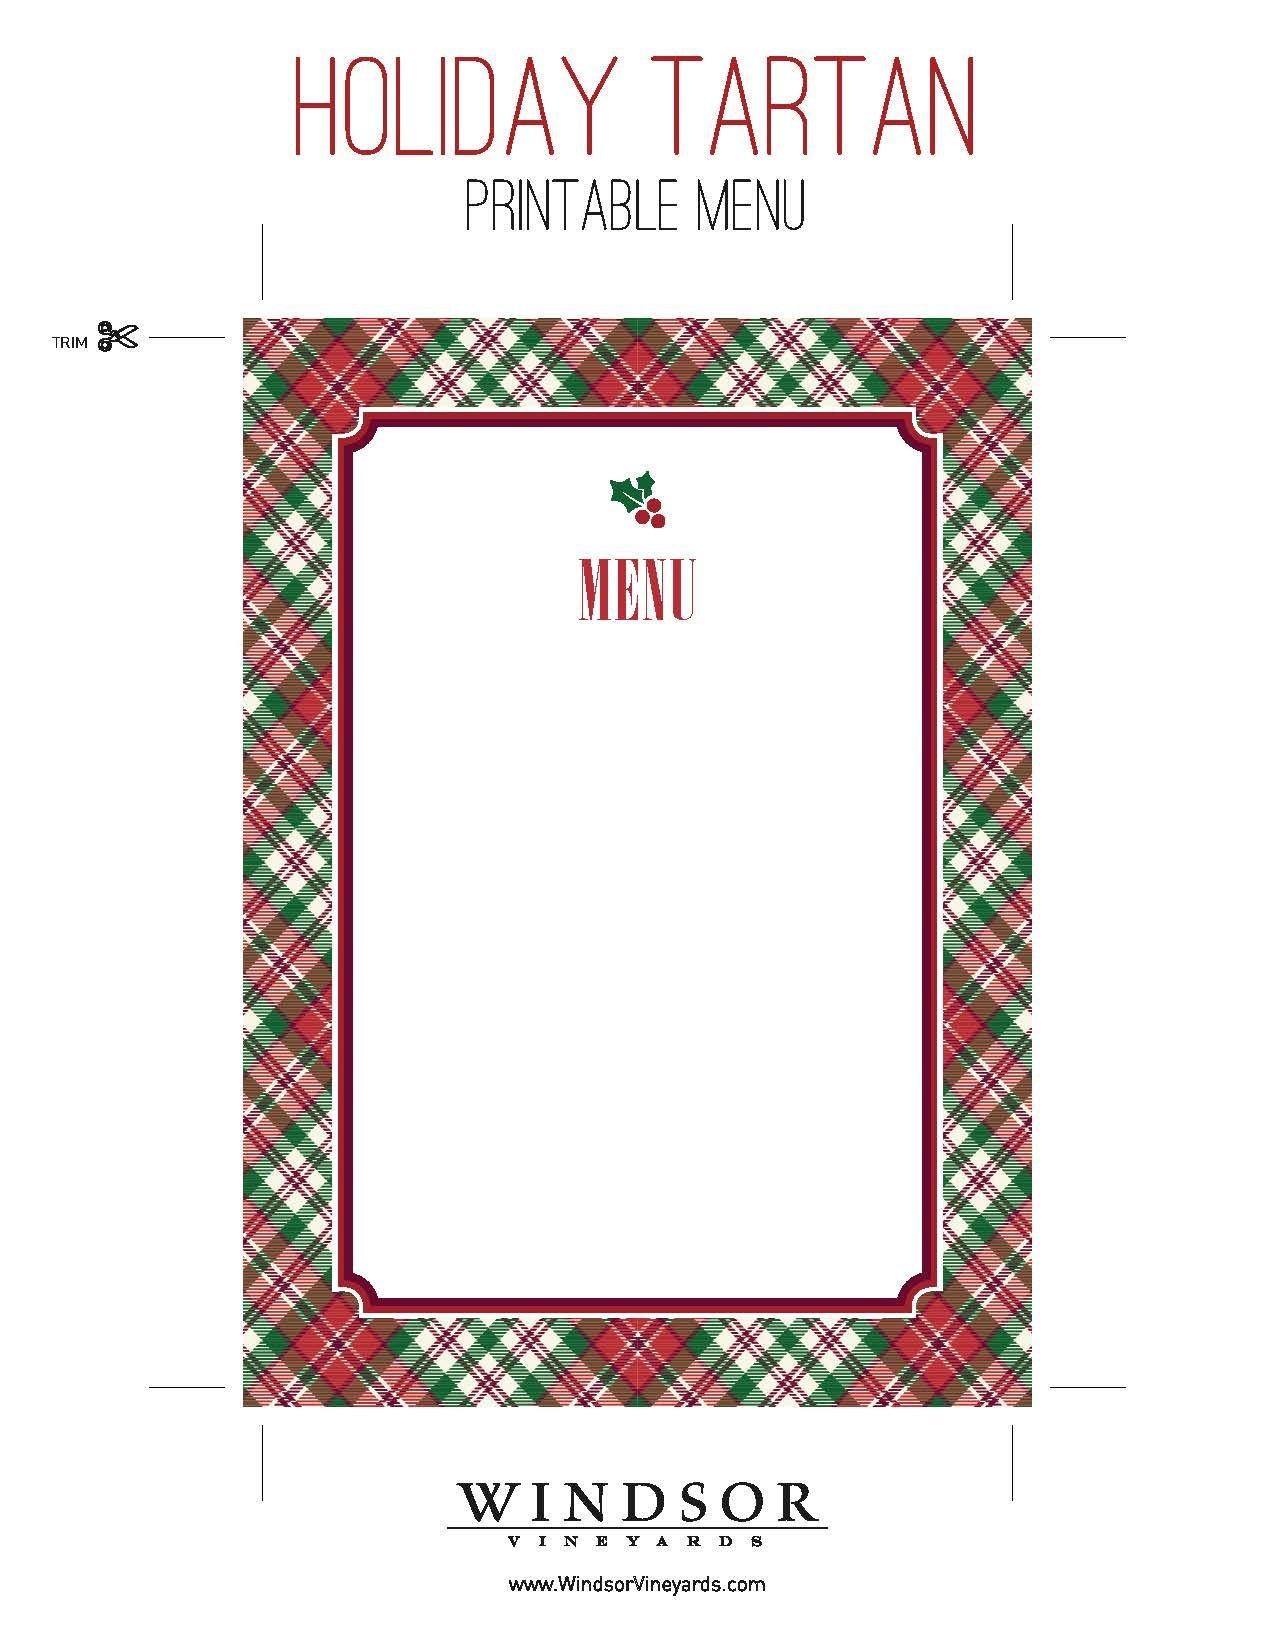 Printable Tartan Menu Template For Holiday Entertaining. Download - Christmas Menu Printable Template Free